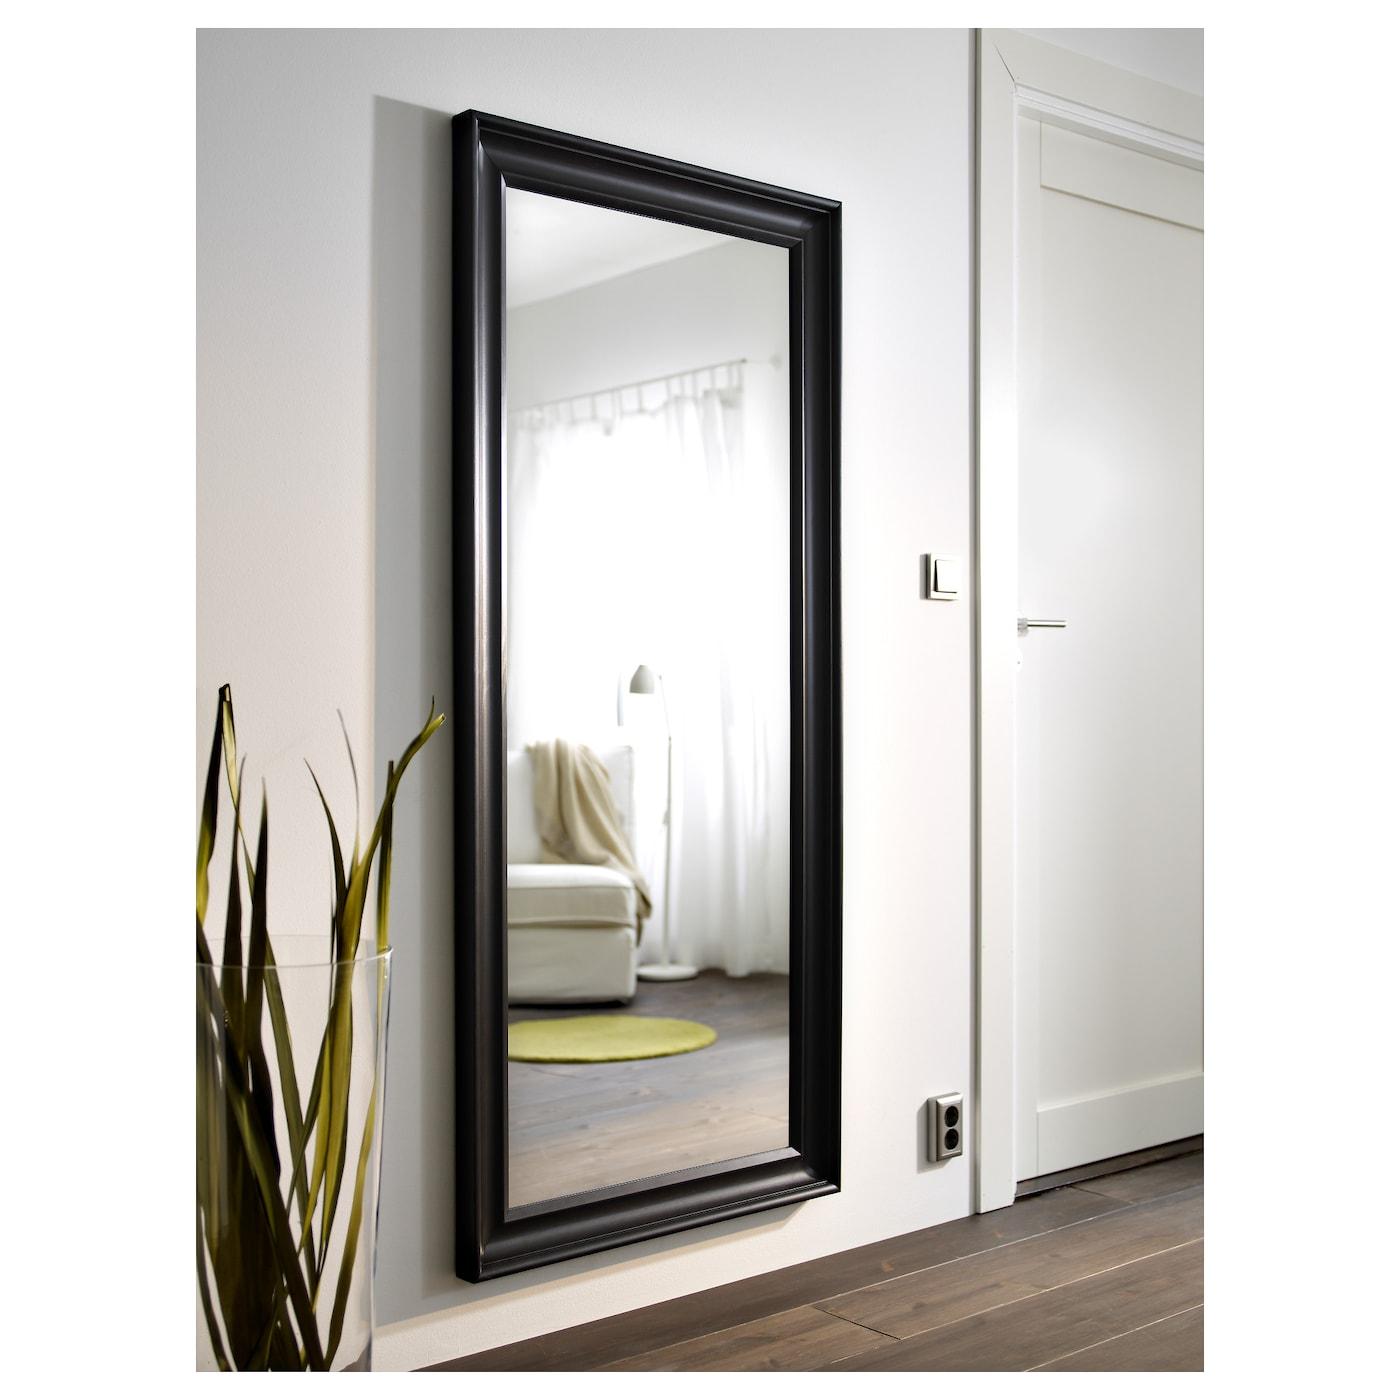 miroir cadre noir ikea. Black Bedroom Furniture Sets. Home Design Ideas